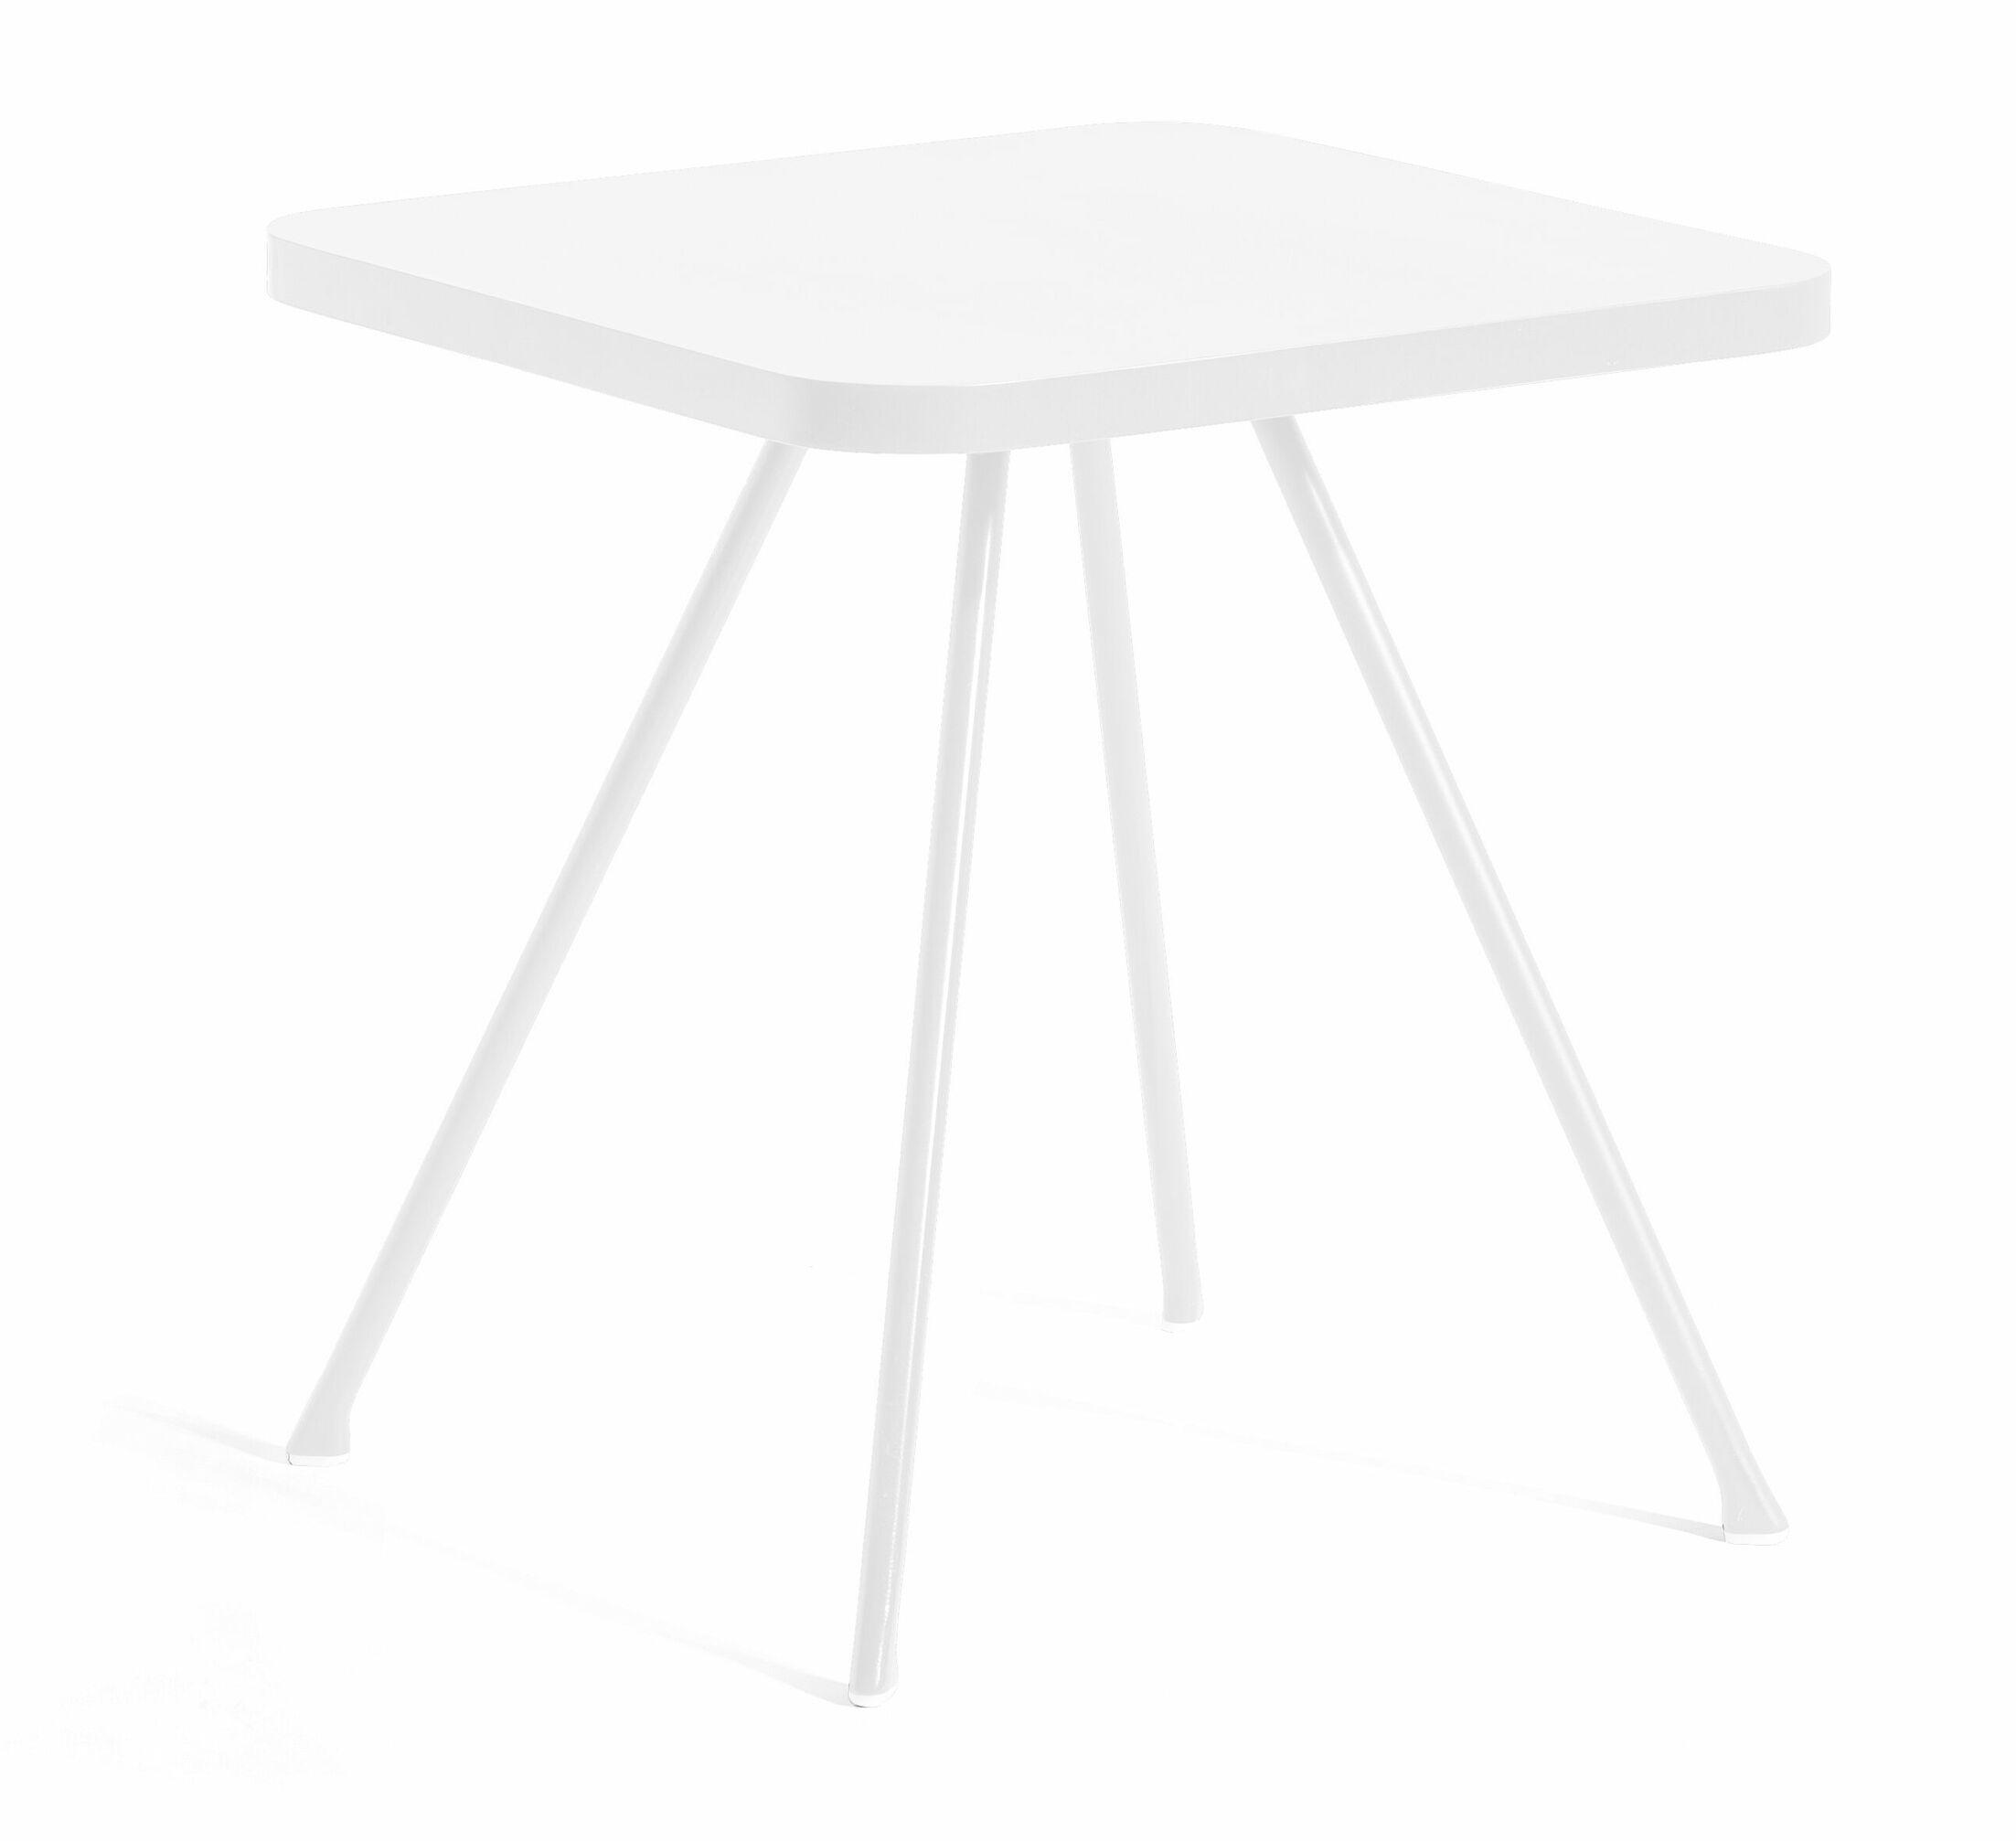 Attol Aluminum Side Table Finish: White